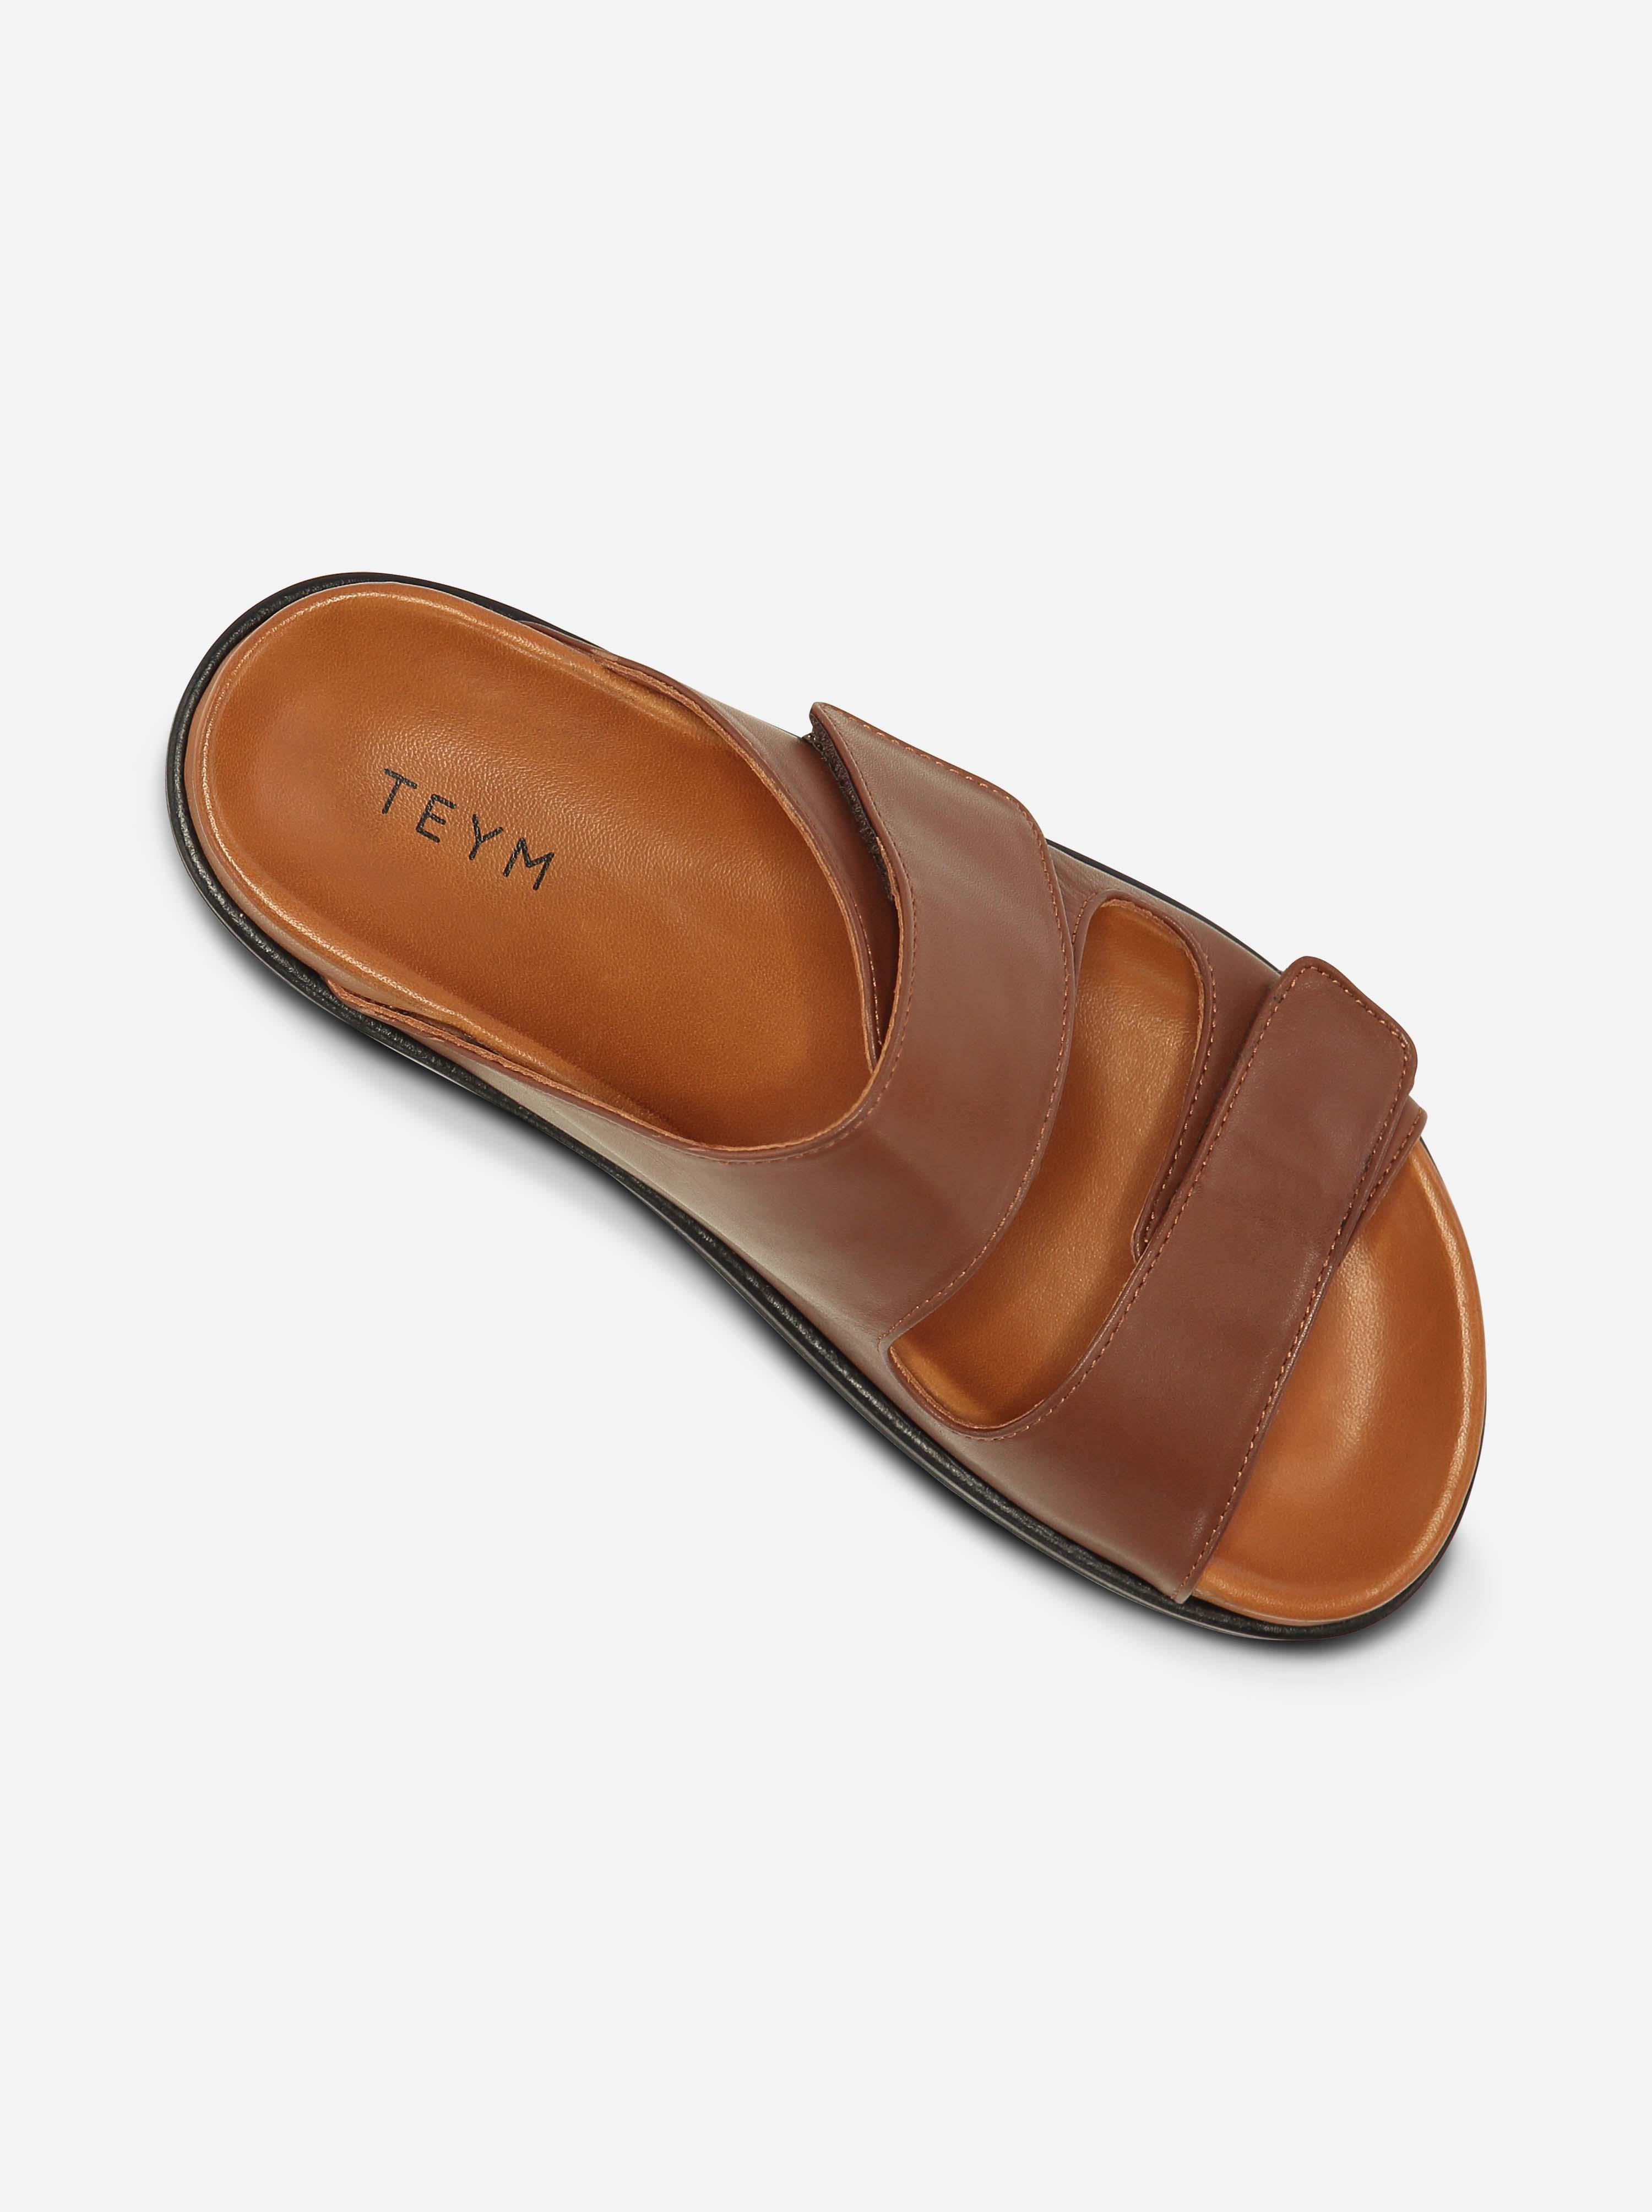 Teym - The Sandal - Brown - 7